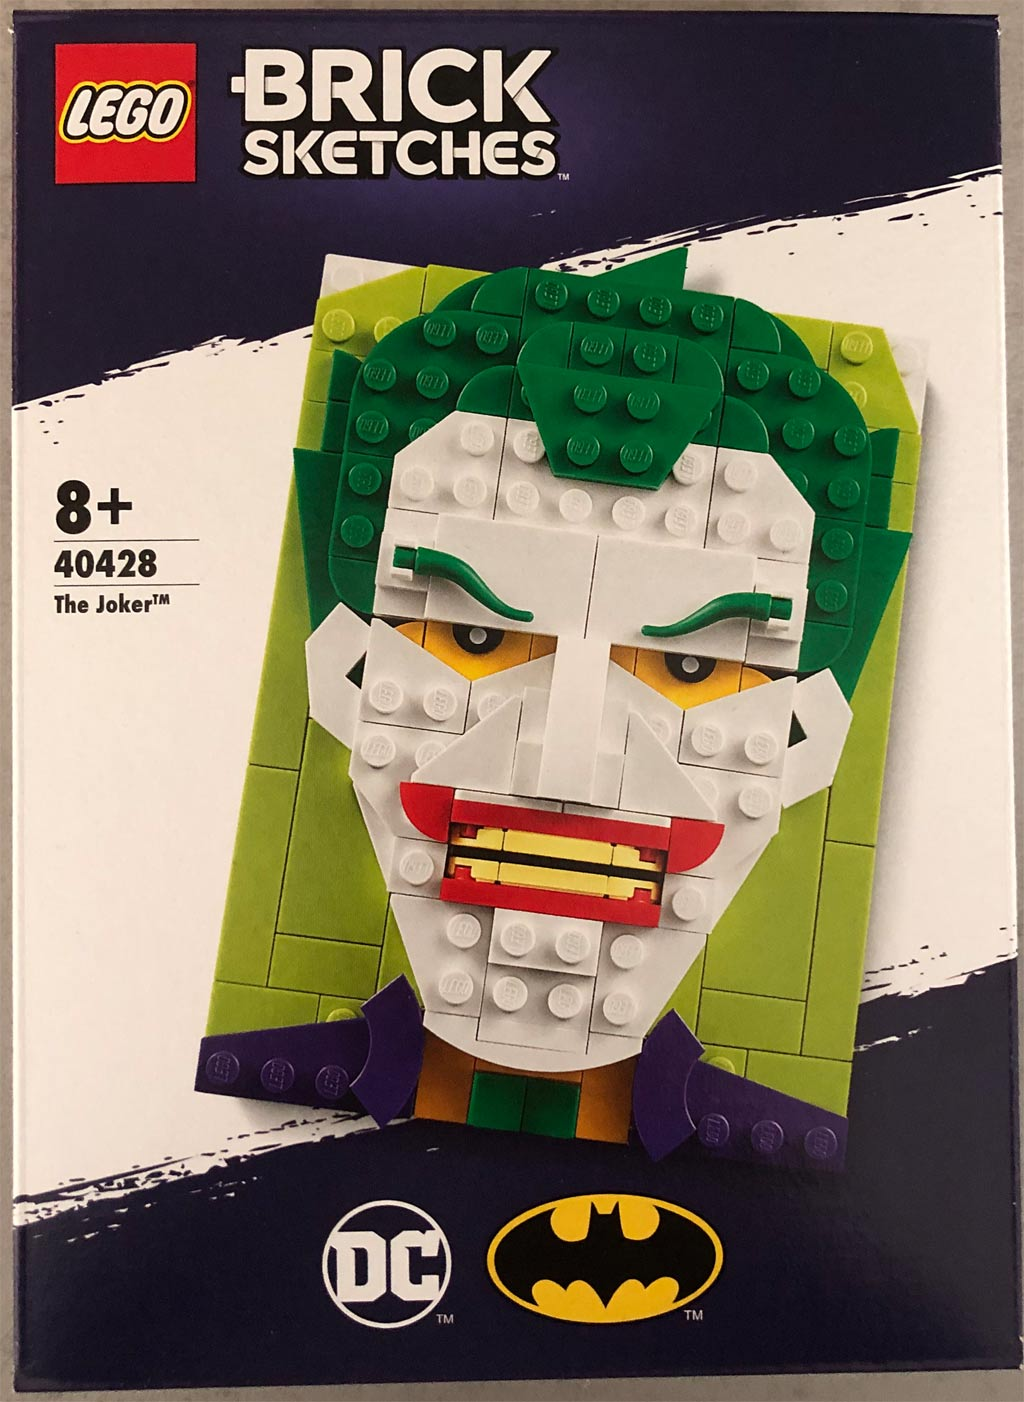 lego-brick-sketches-40428-joker-2020-zusammengebaut-michael-kopp zusammengebaut.com